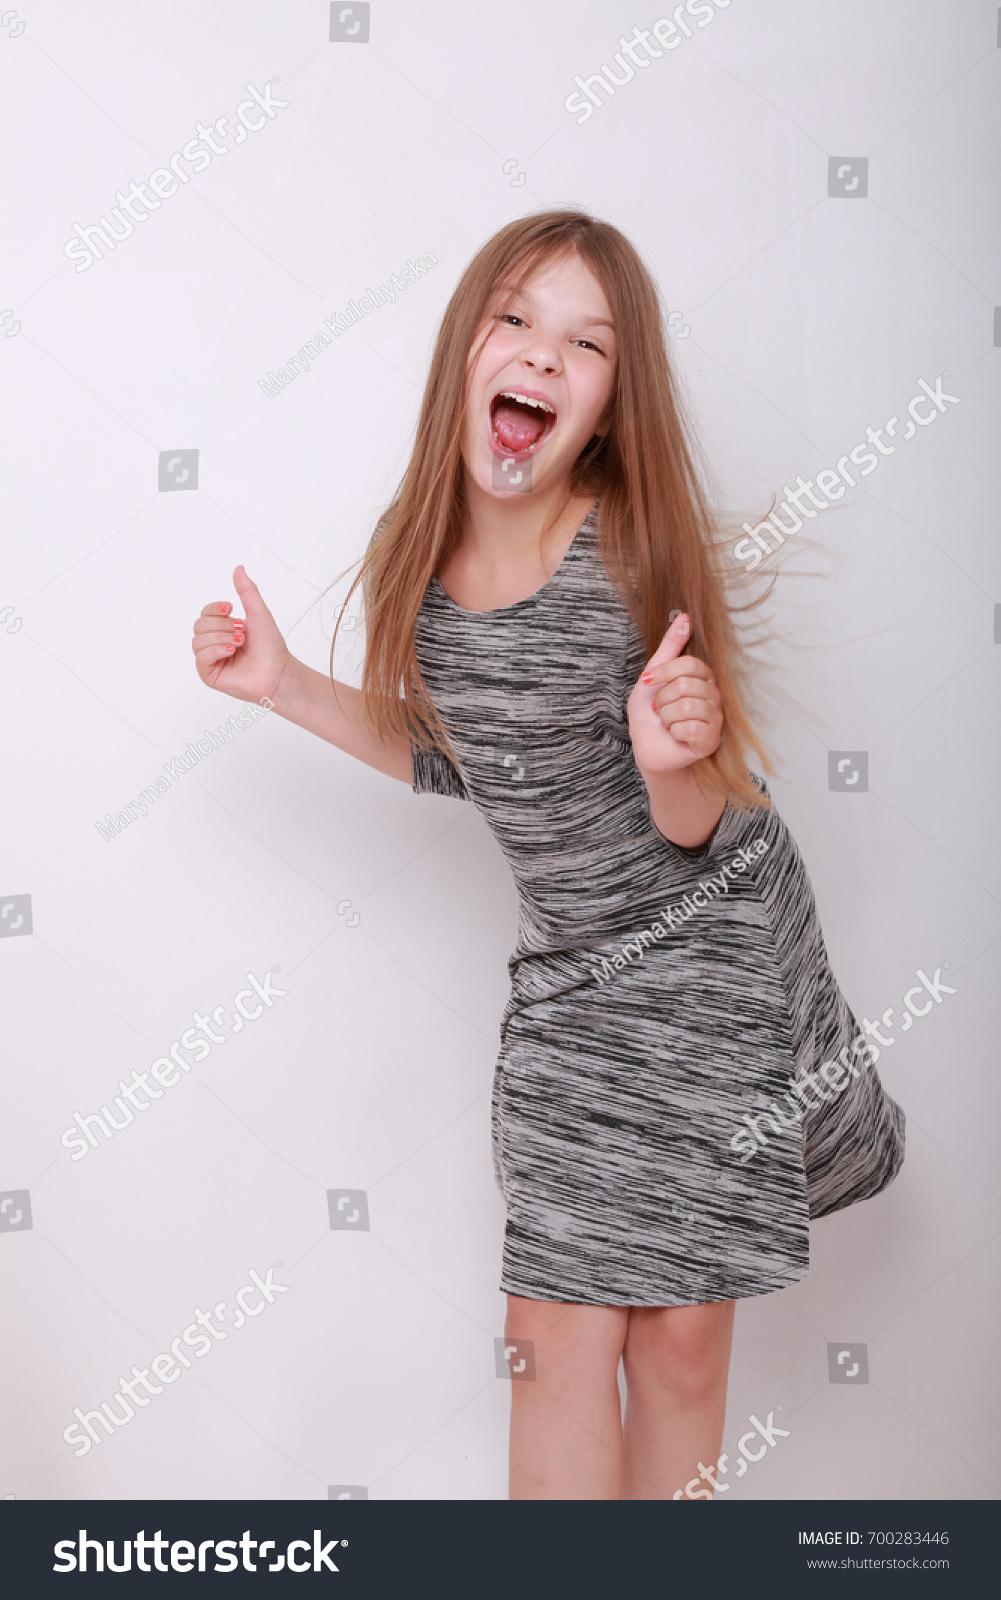 Teens Girls Modeling